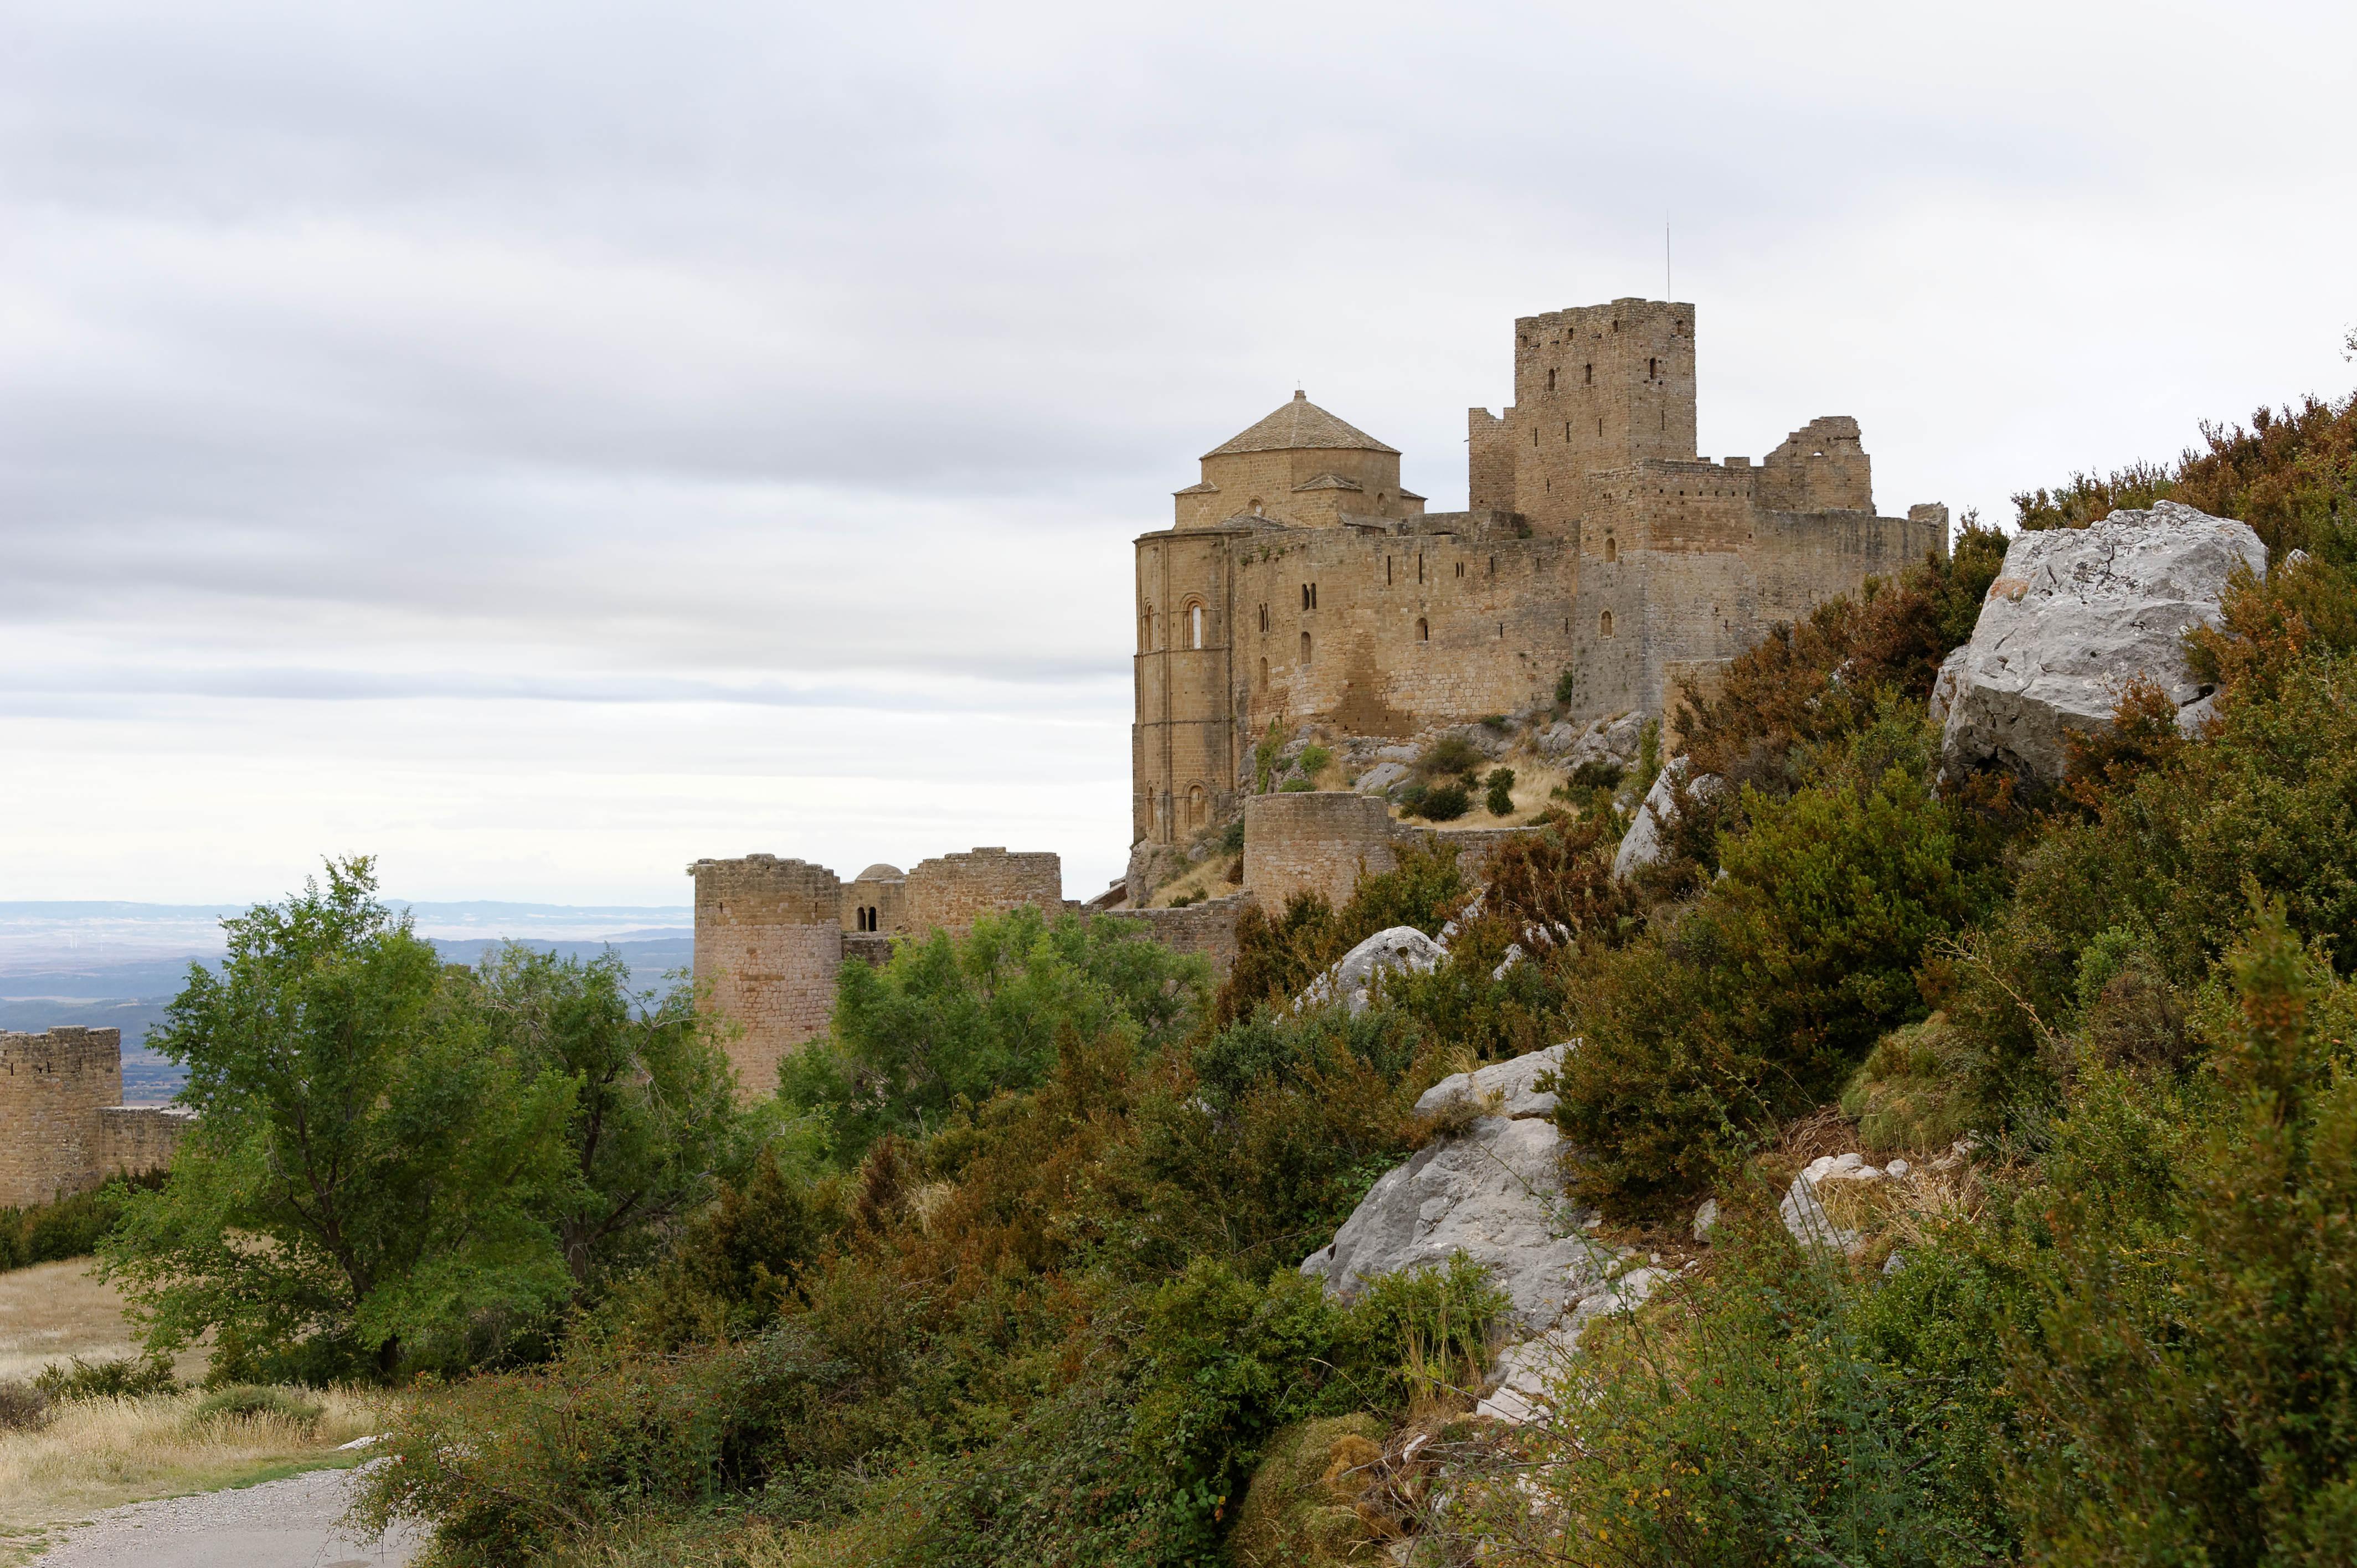 3649_Chateau de Loarre (Aragon)